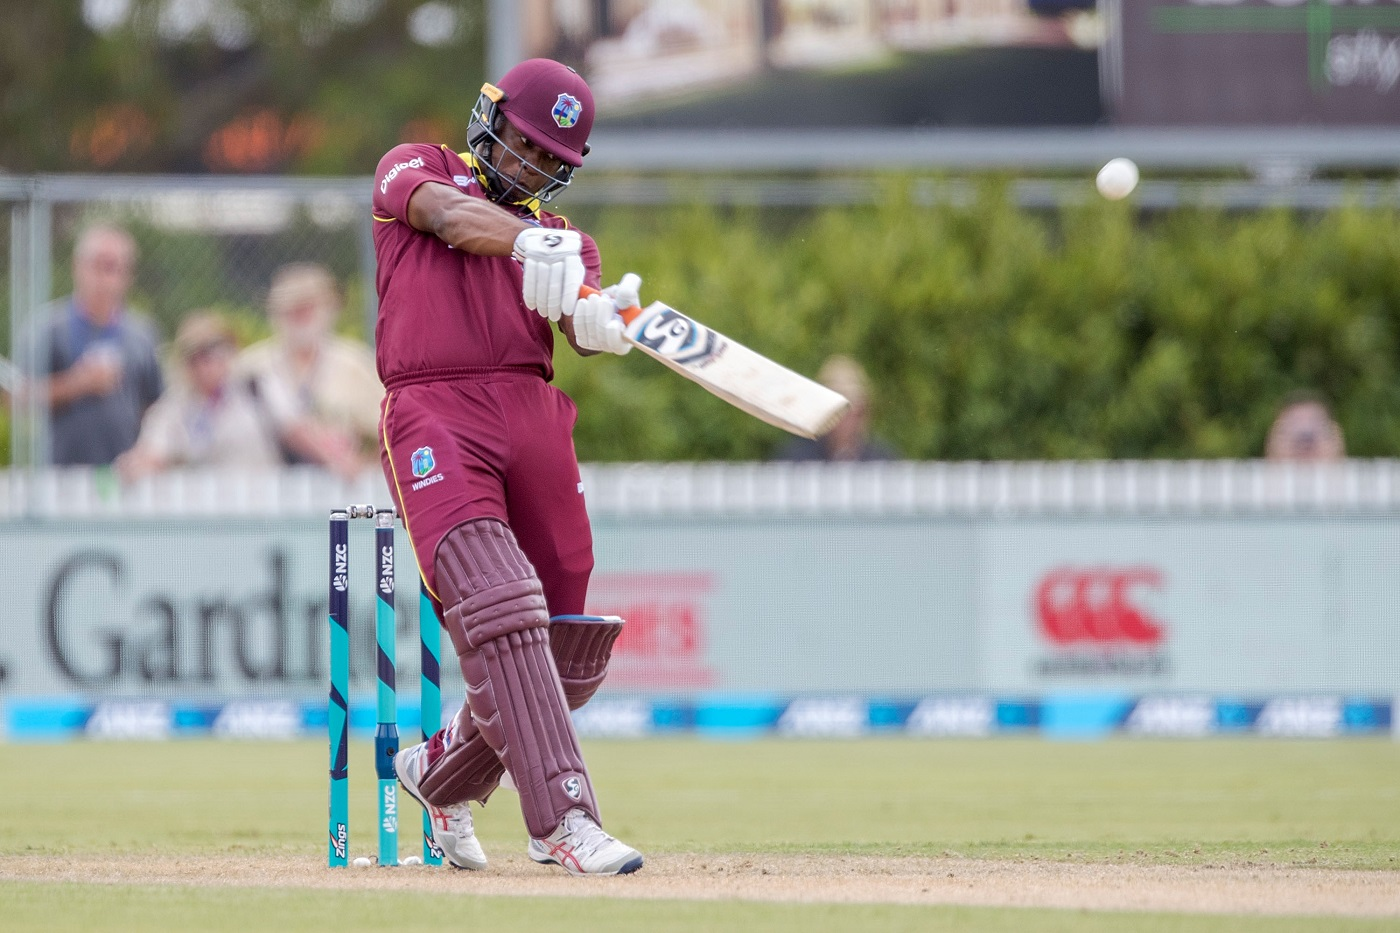 ICC ODI Rankings: Trent Boult Returns to Top Five; Virat Kohli Stays at Top